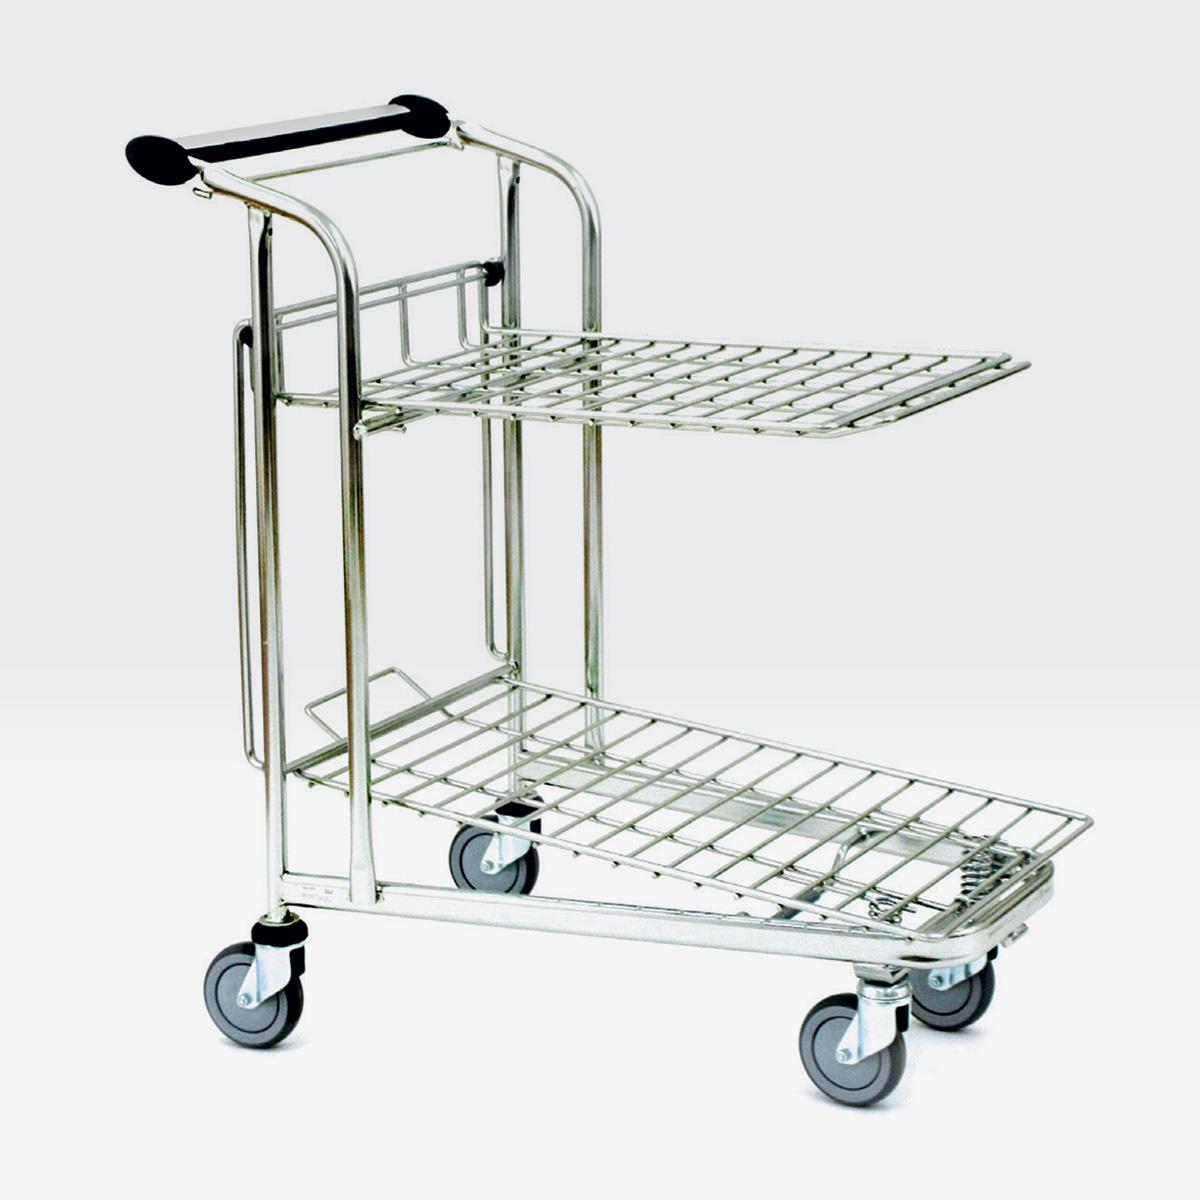 Carrello trasporto merci VARIO WTP-3D